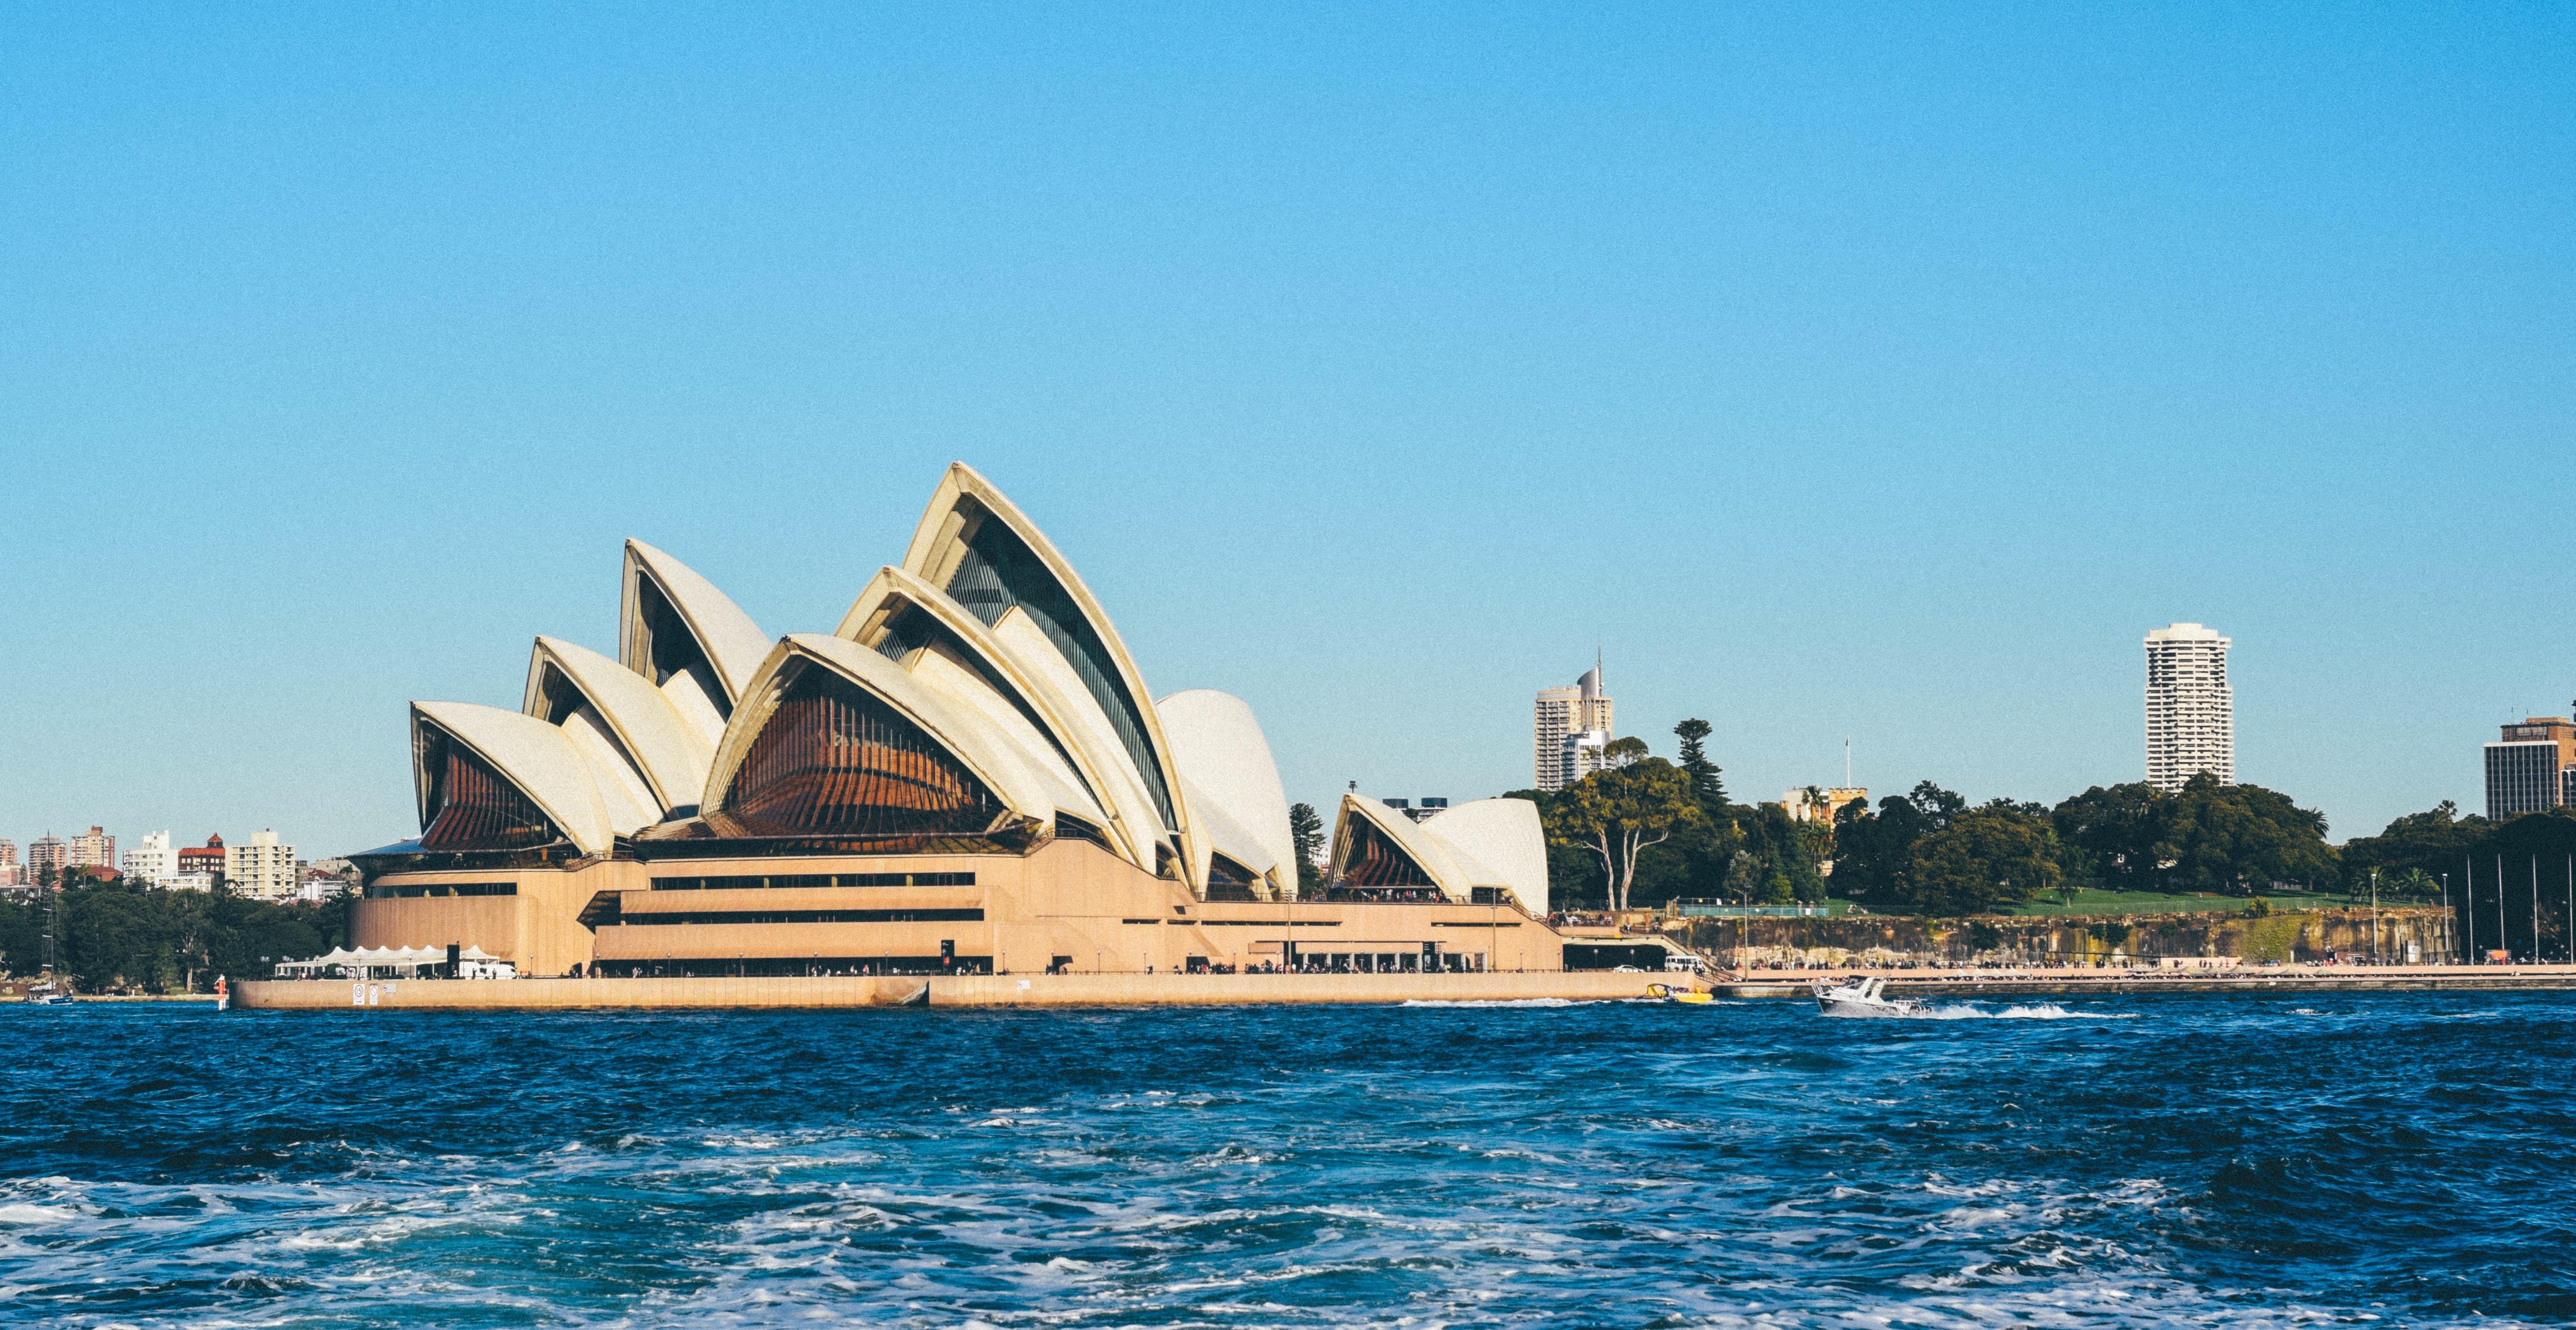 Sea Architecture Vacation Vehicle Sydney Opera House Landmark Harbor Harbour Tourism Australia Resort Culture Famous